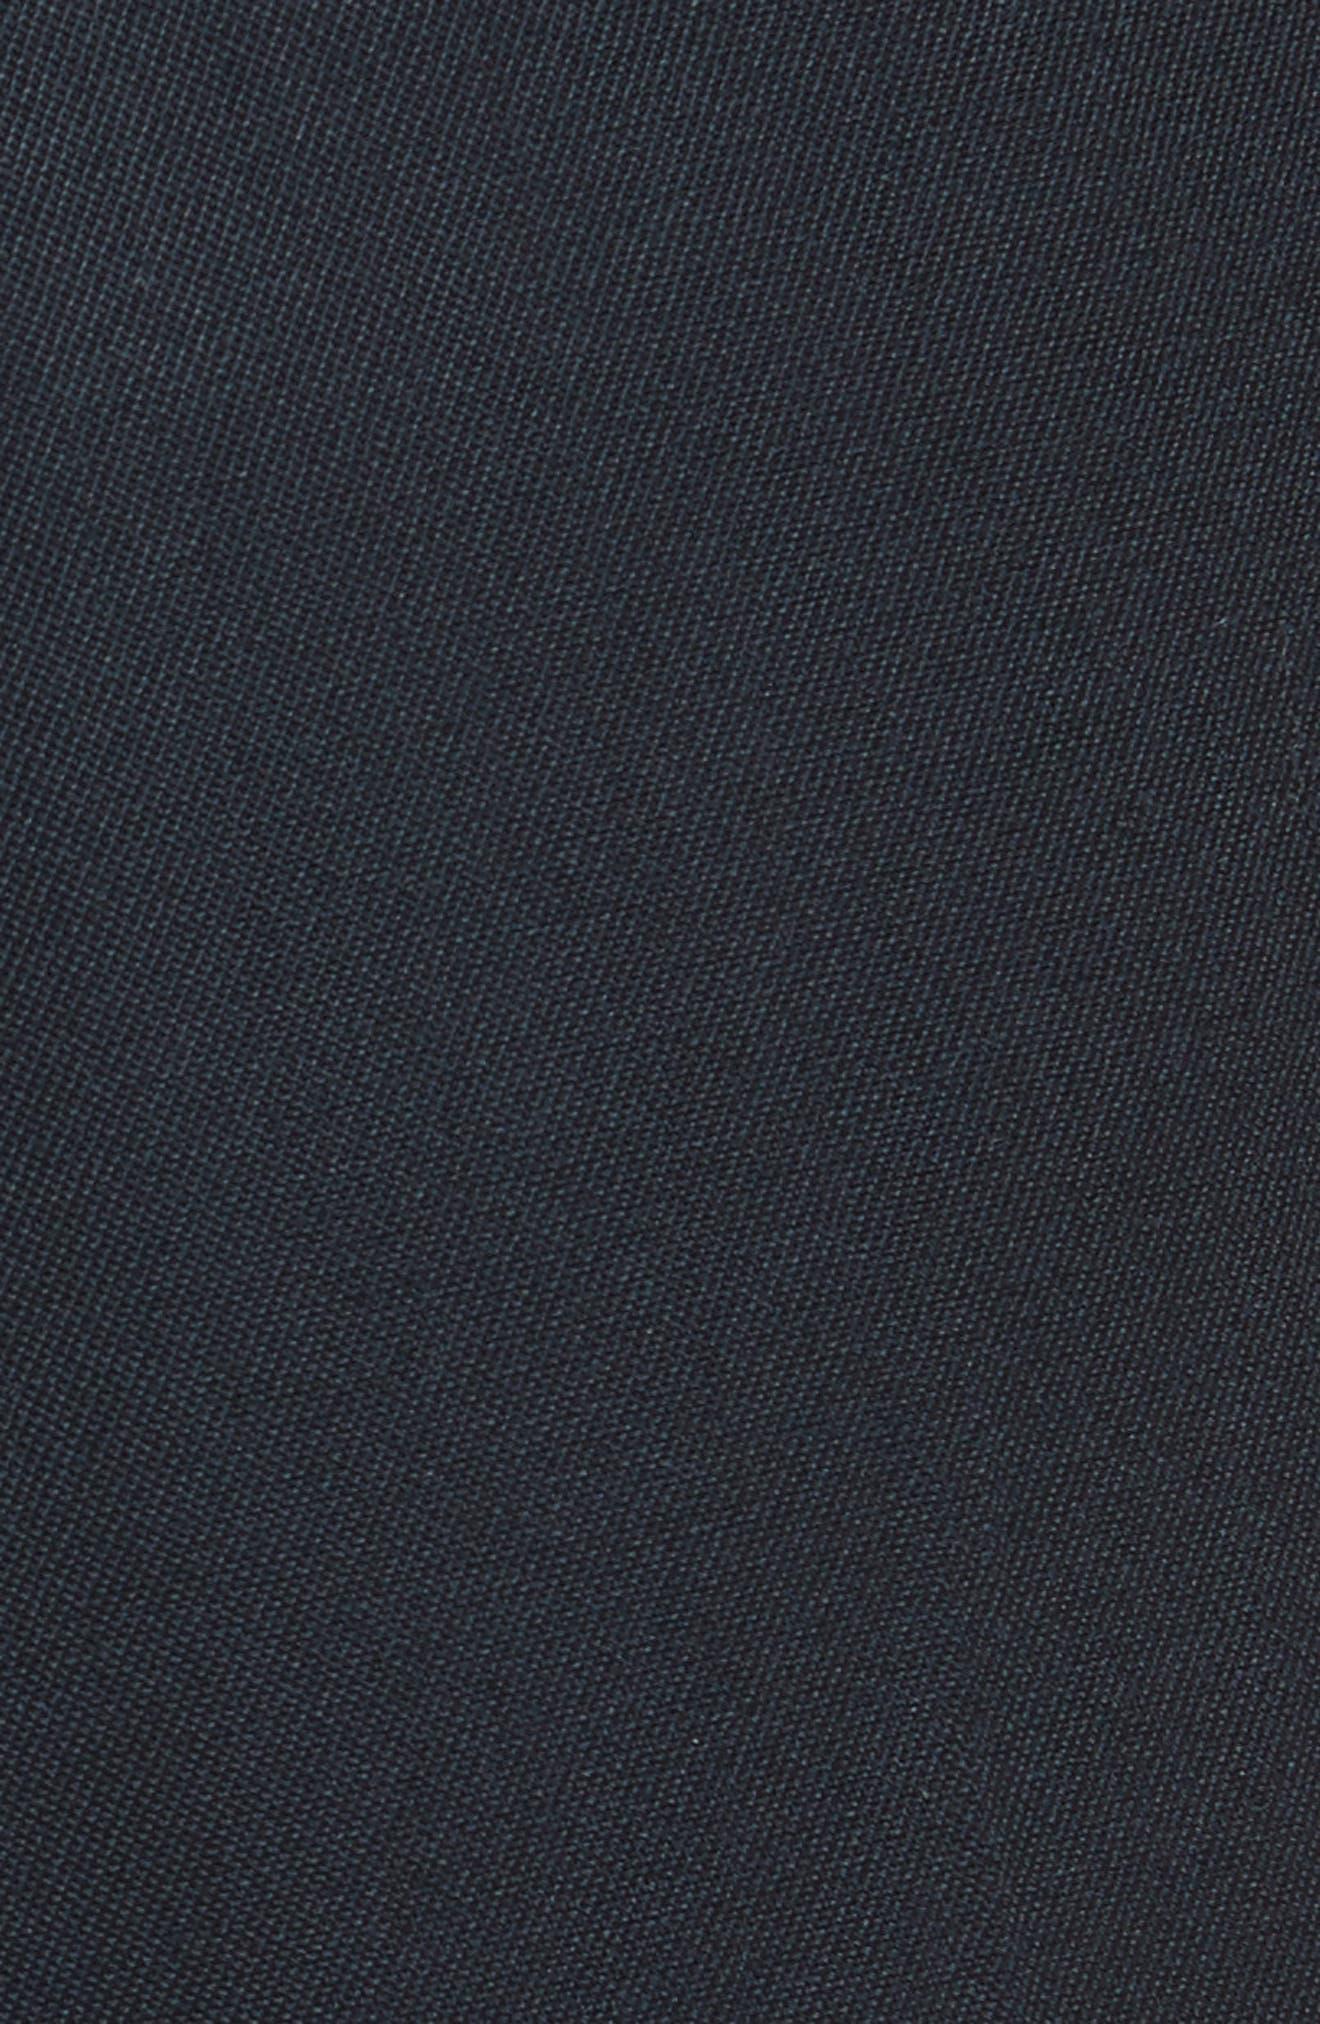 Split Hem Flare Trousers,                             Alternate thumbnail 5, color,                             410